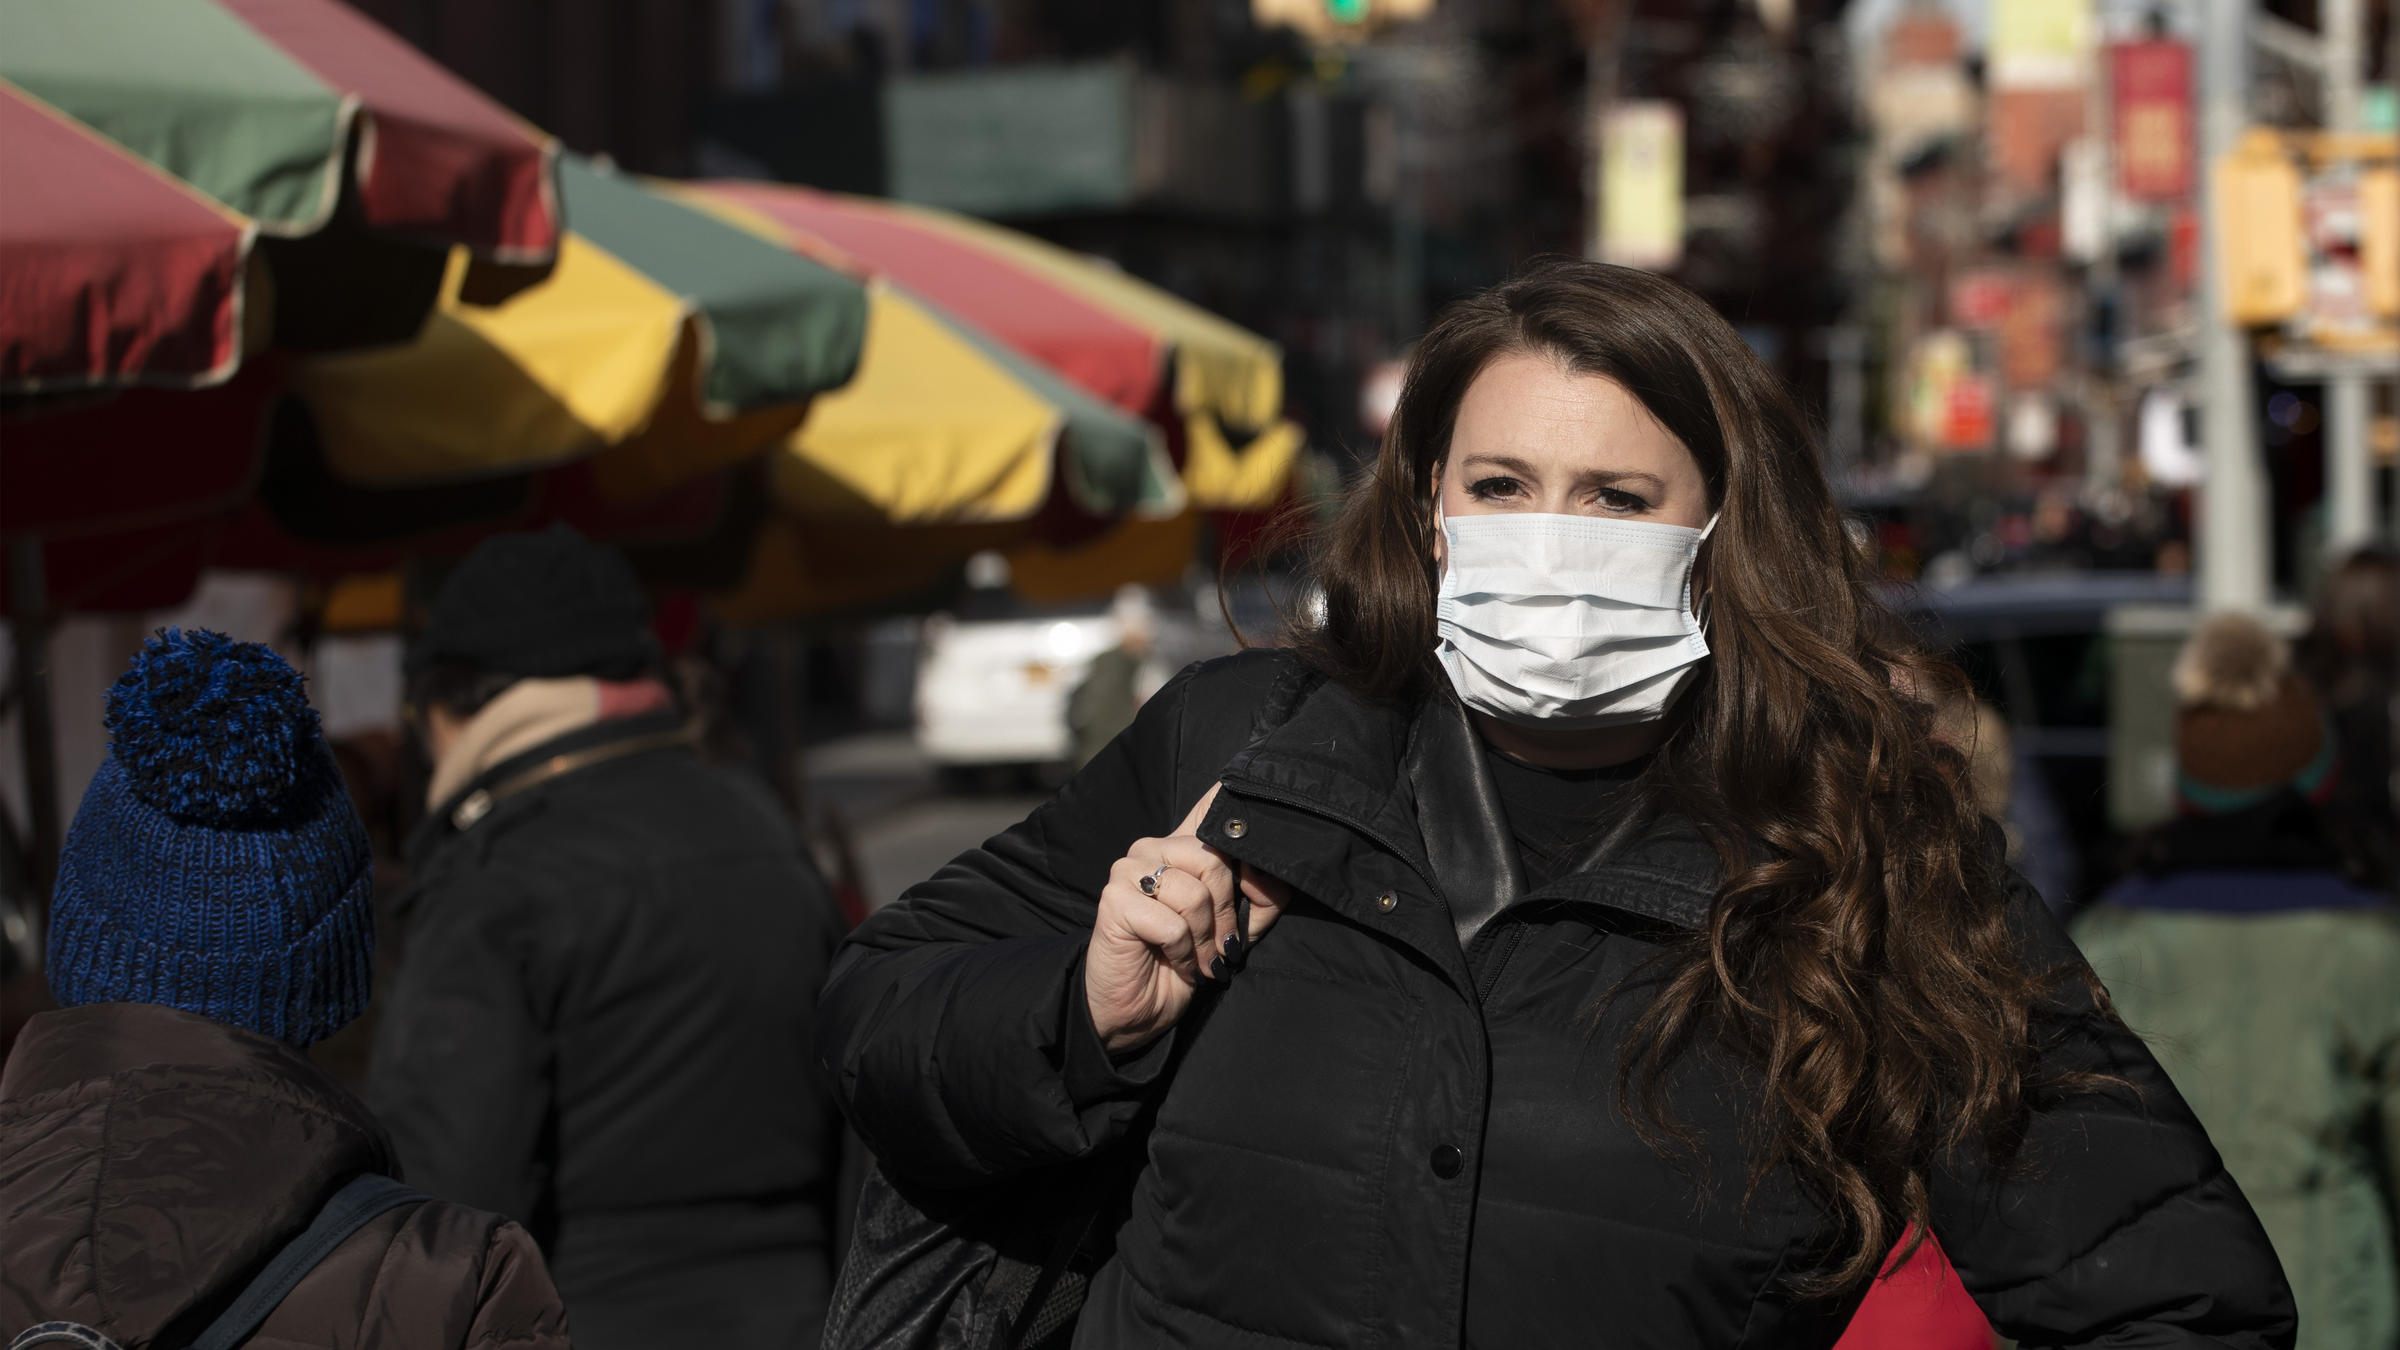 masques de protection coronavirus